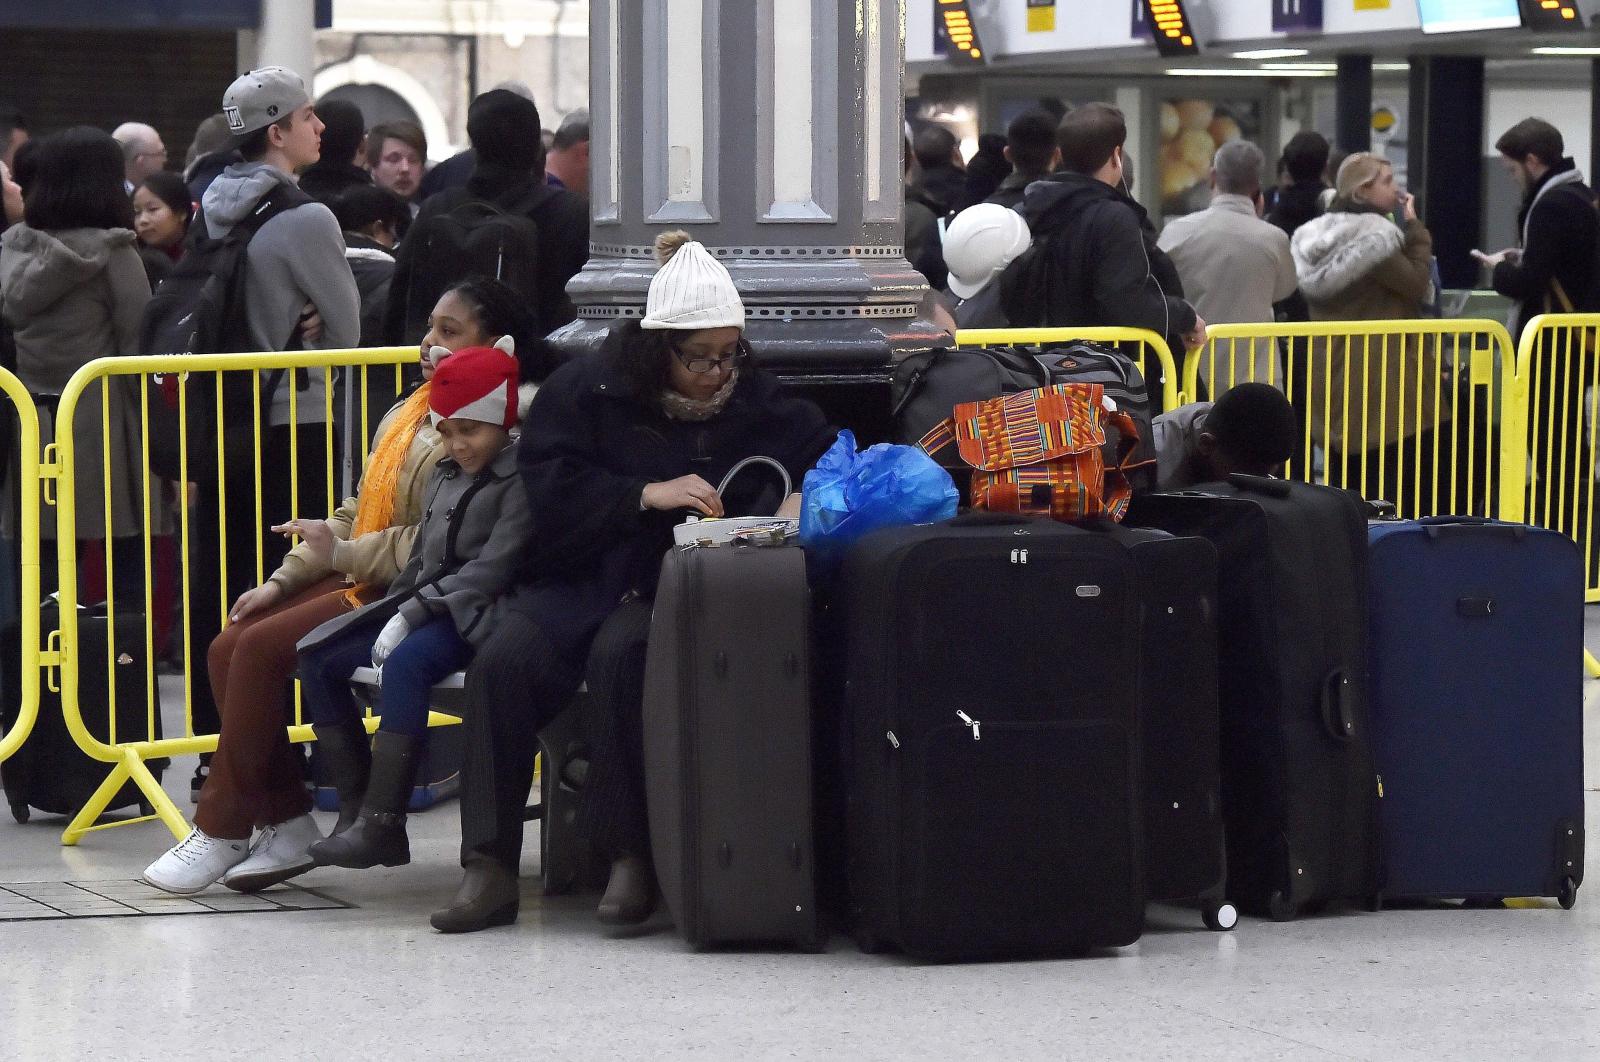 Strajk na dworcu Vitoria Station w Londynie. Fot. PAP/EPA/HANNAH MCKAY